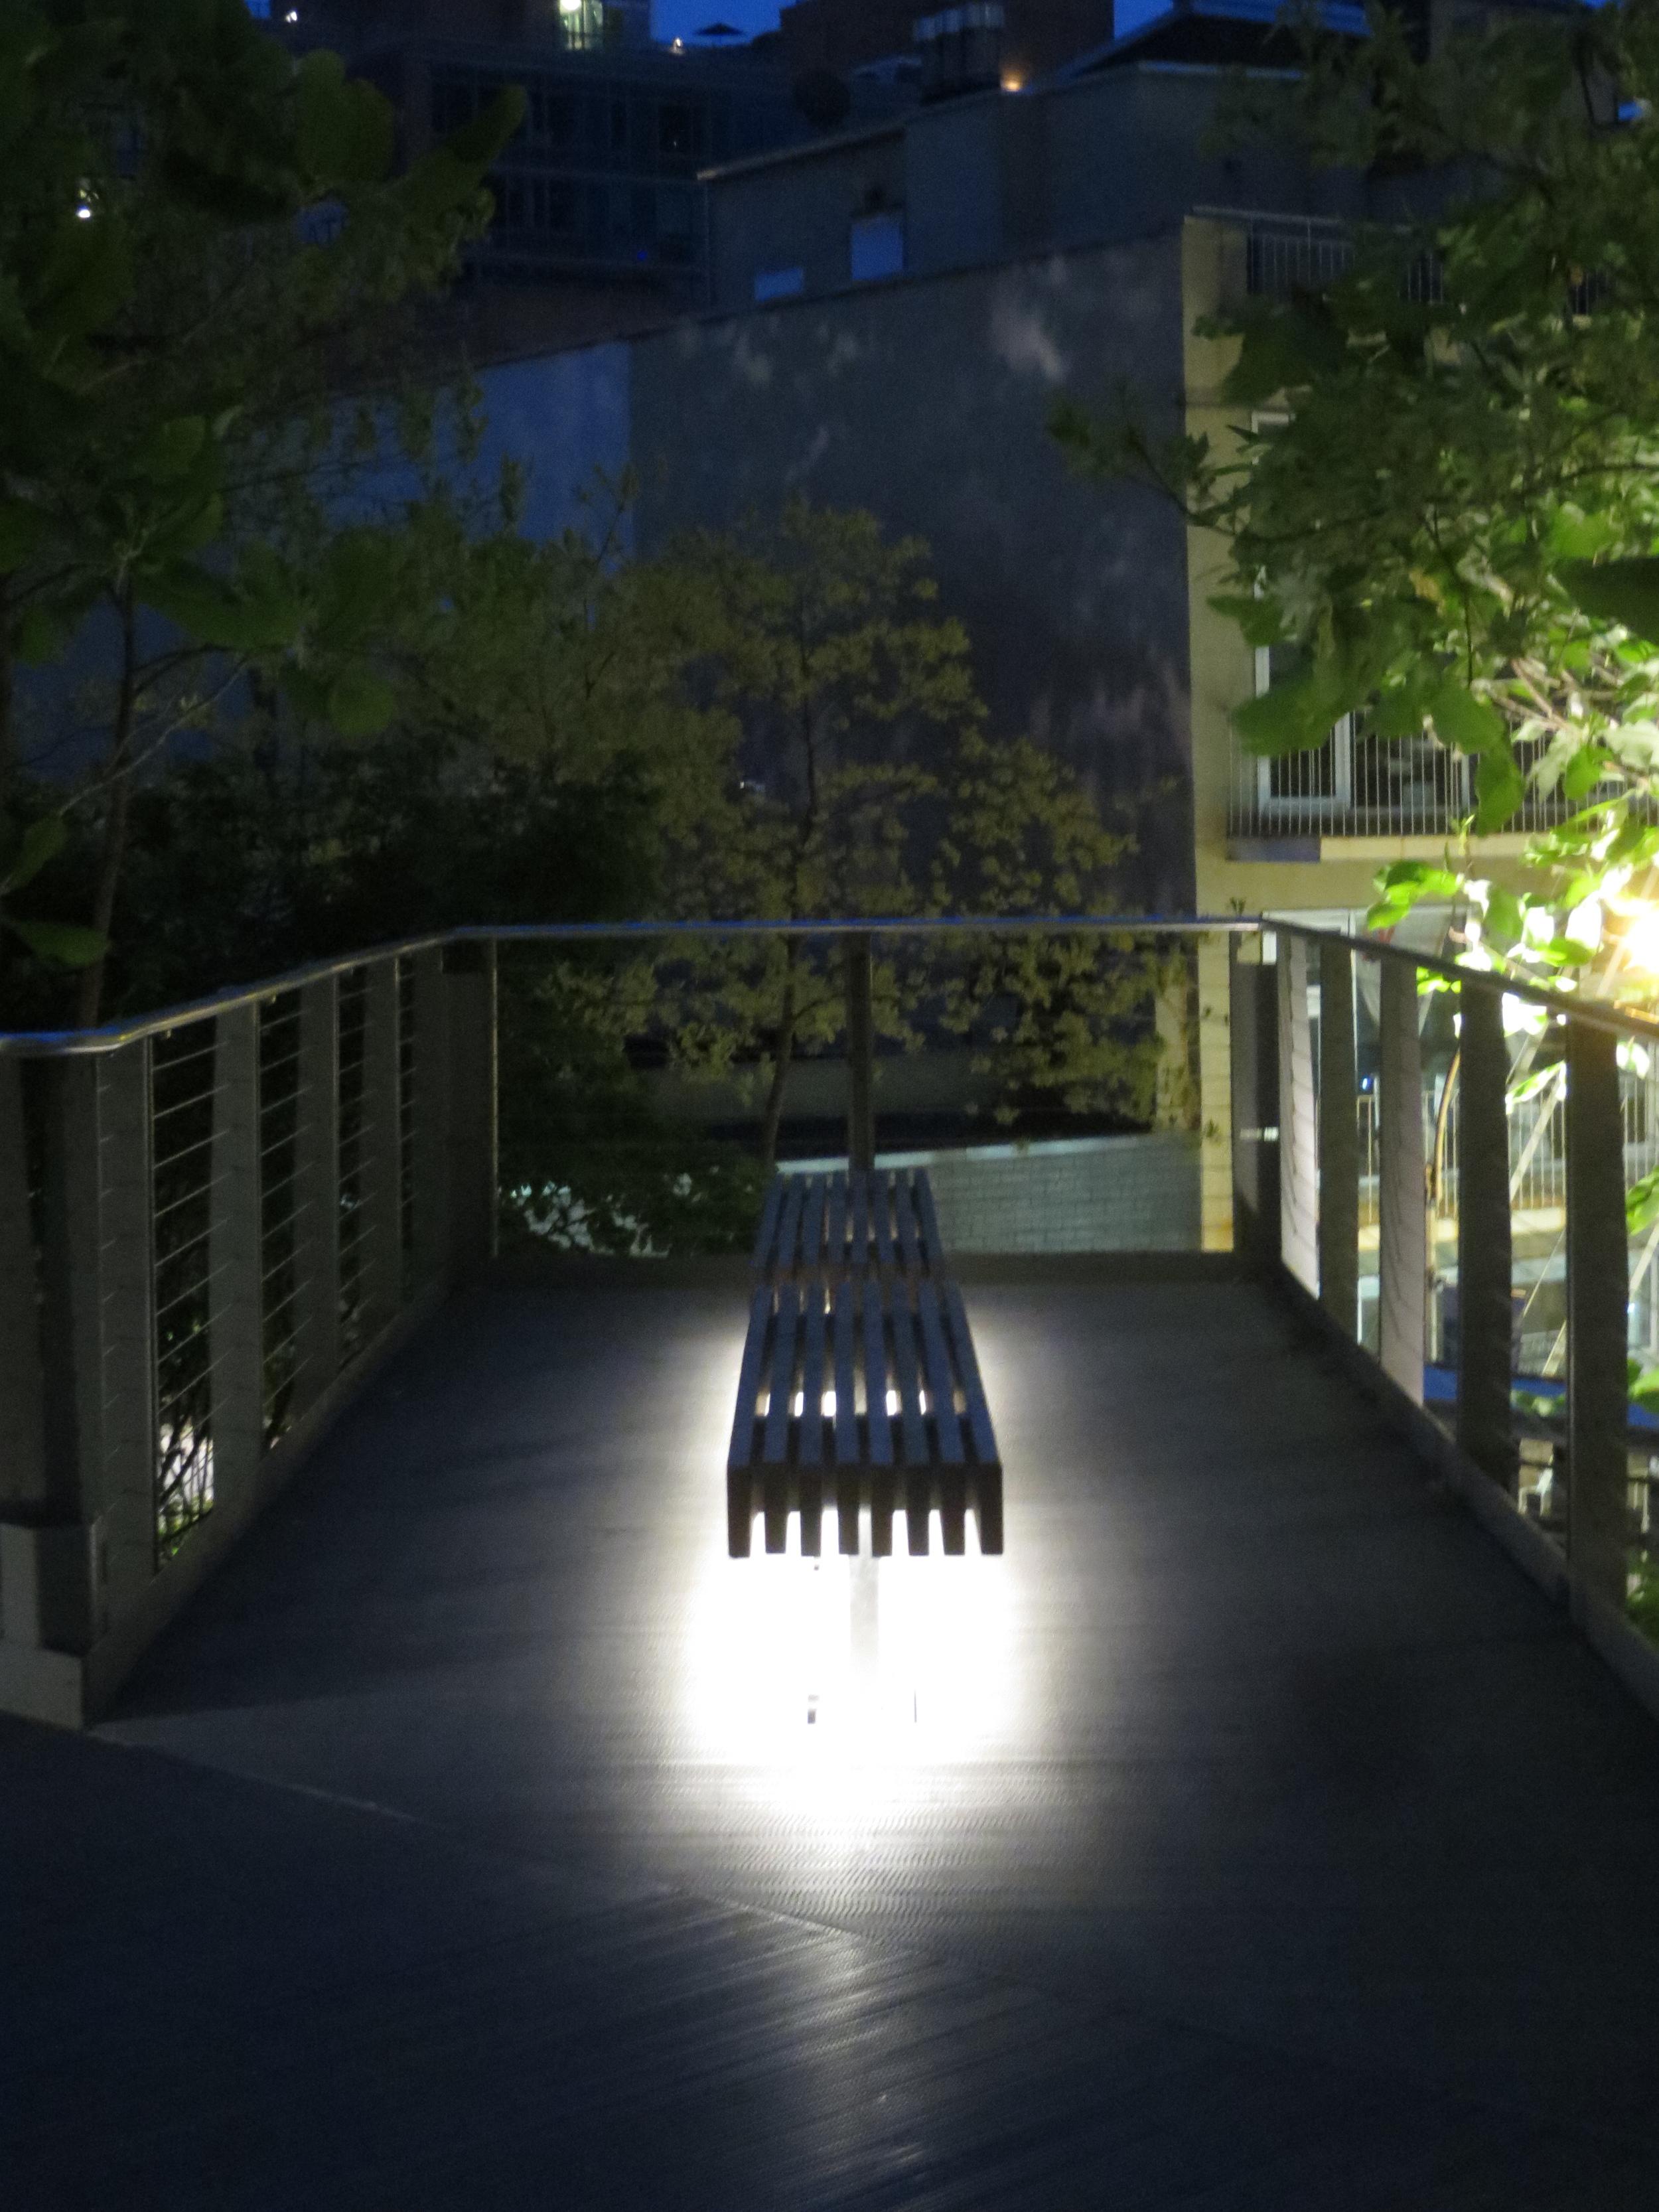 Lit bench